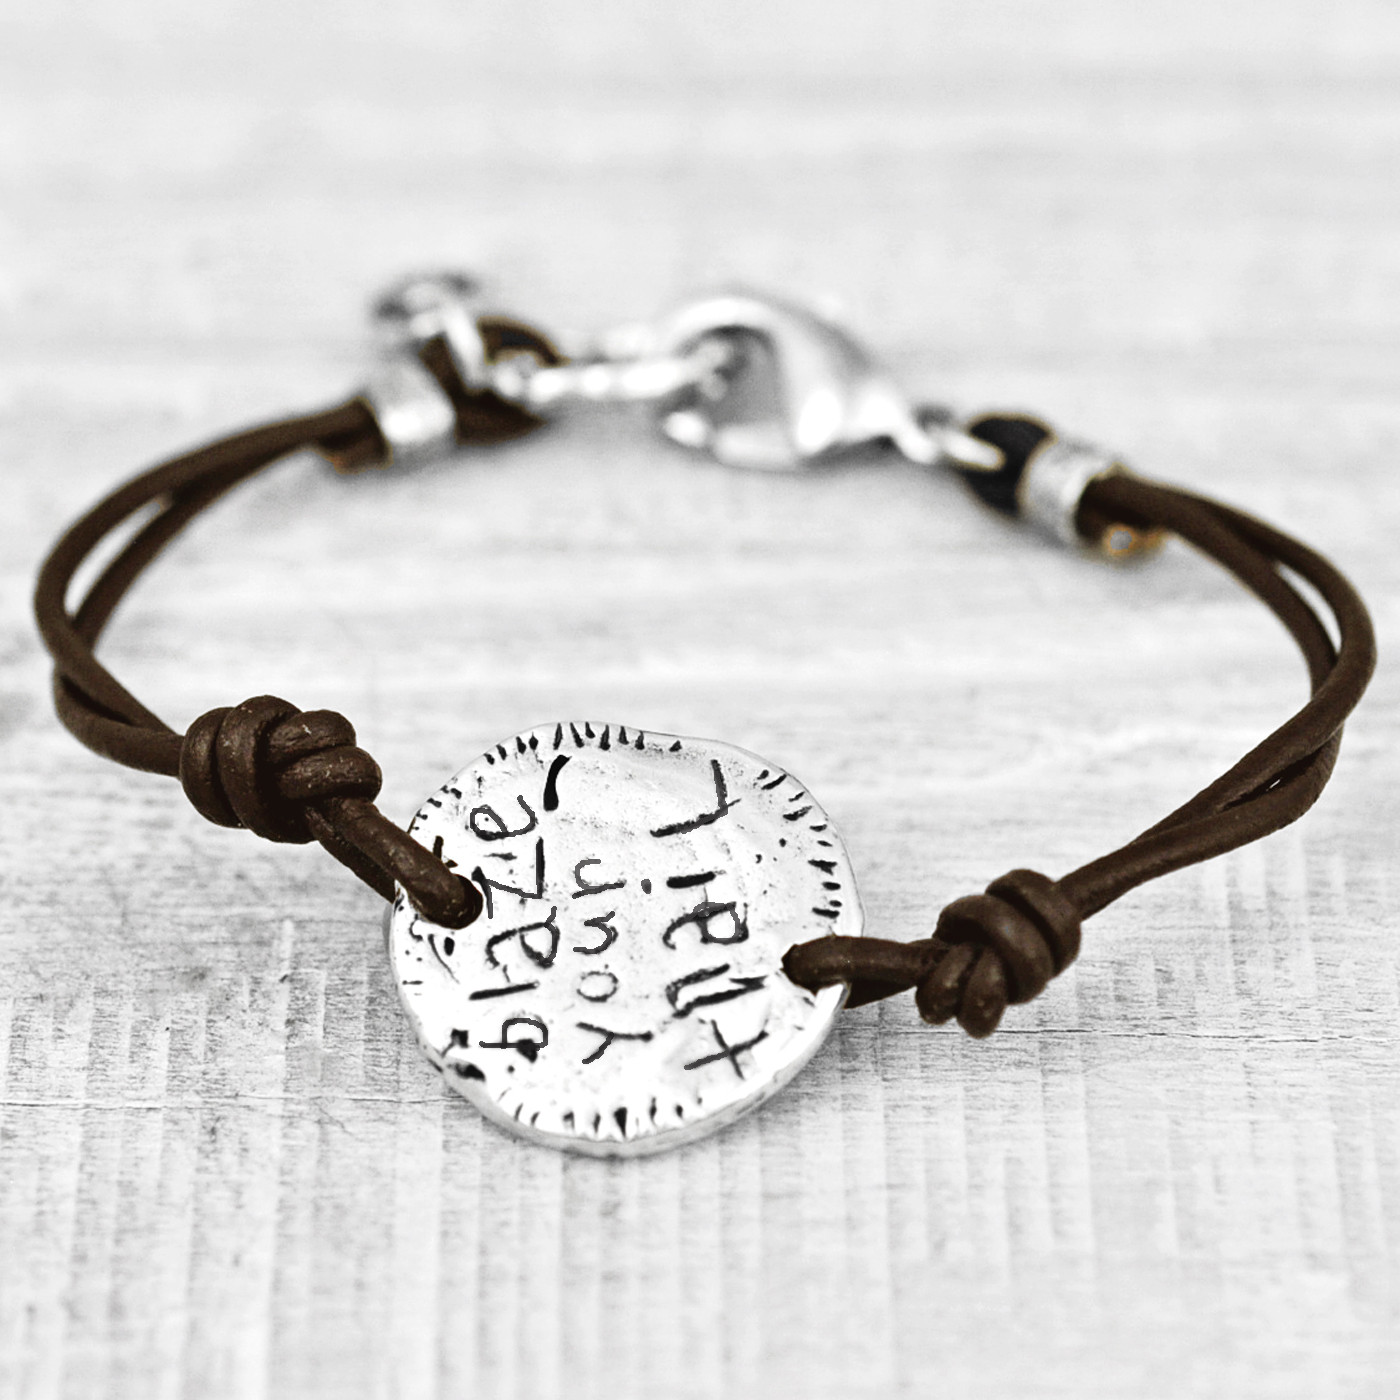 b484_blazetrail_bracelet_2_IC.jpeg